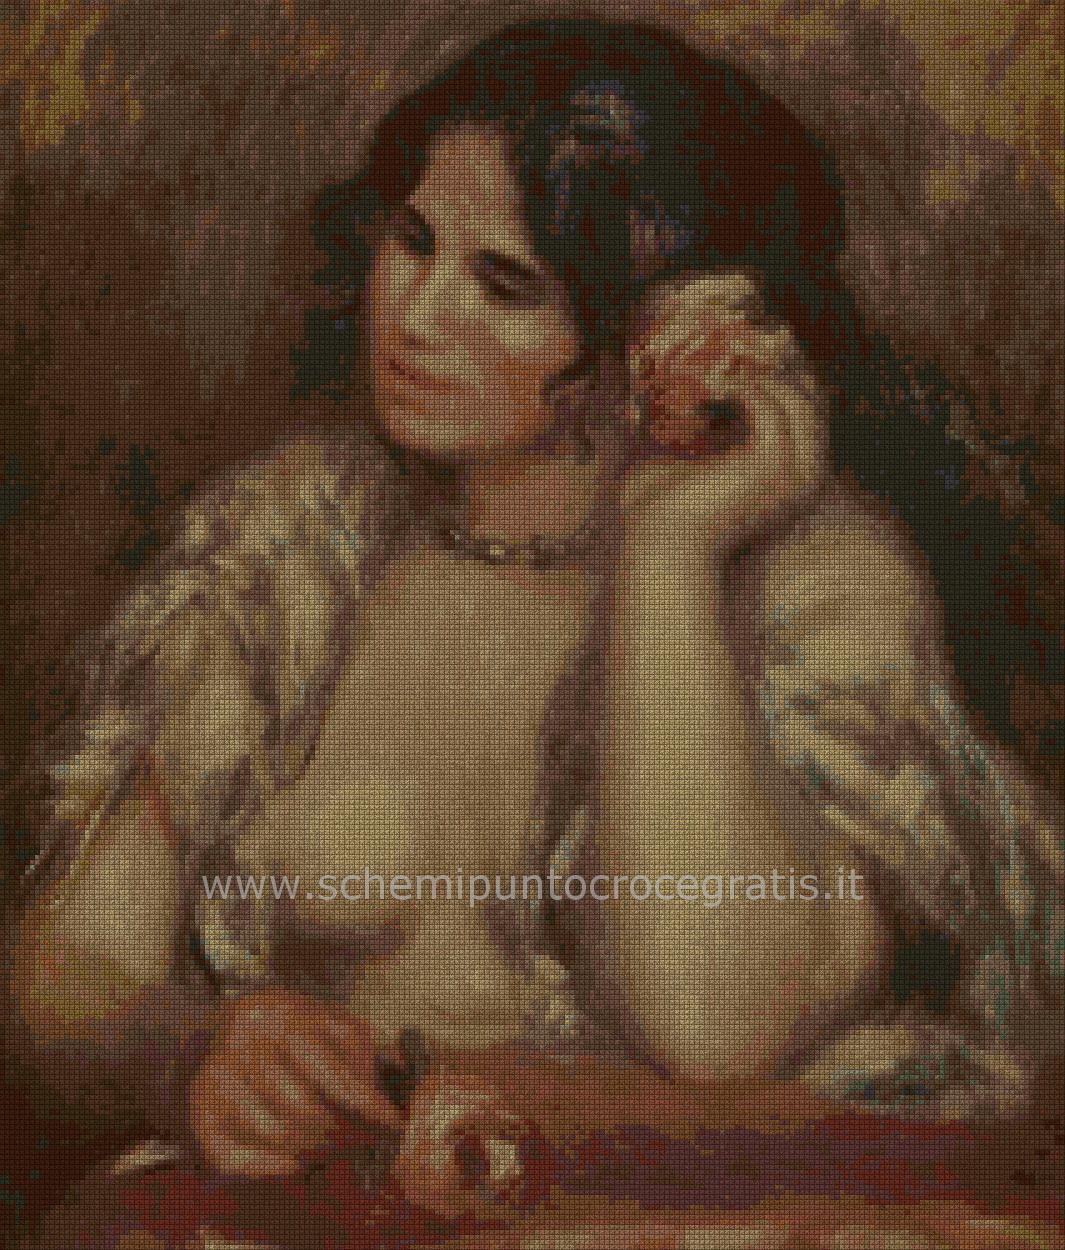 pittori_moderni/renoir/Renoir29.jpg